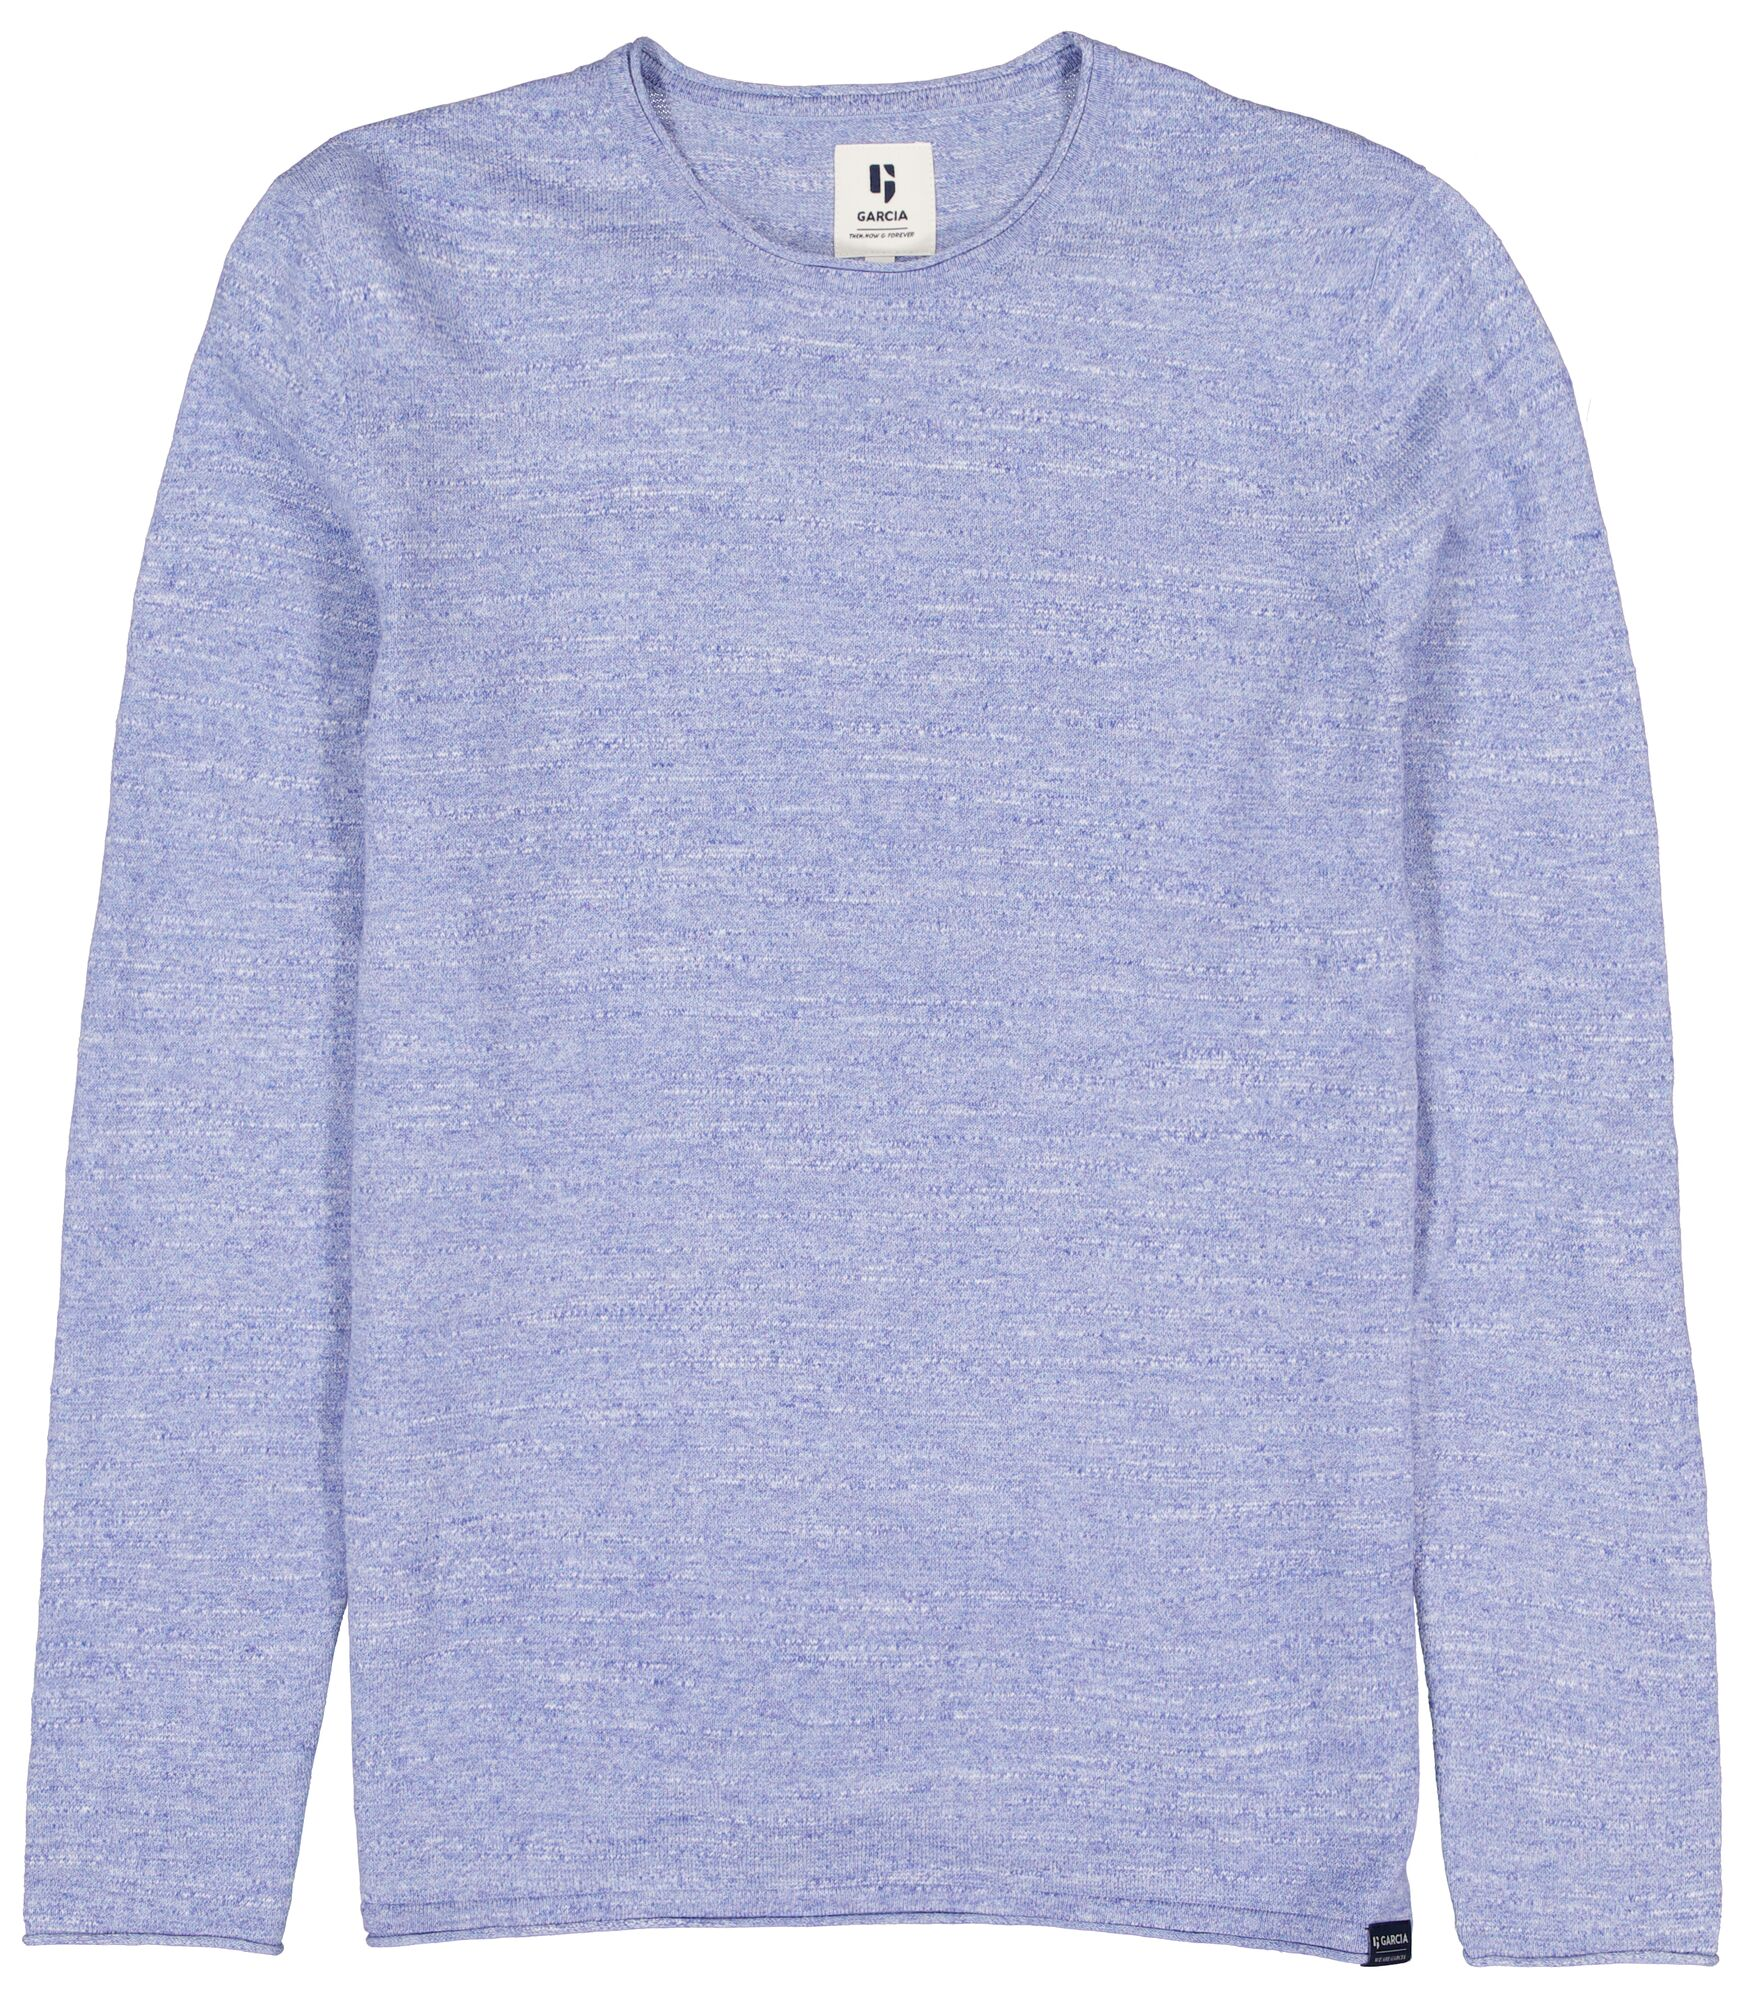 Garcia - Men-Pullovers